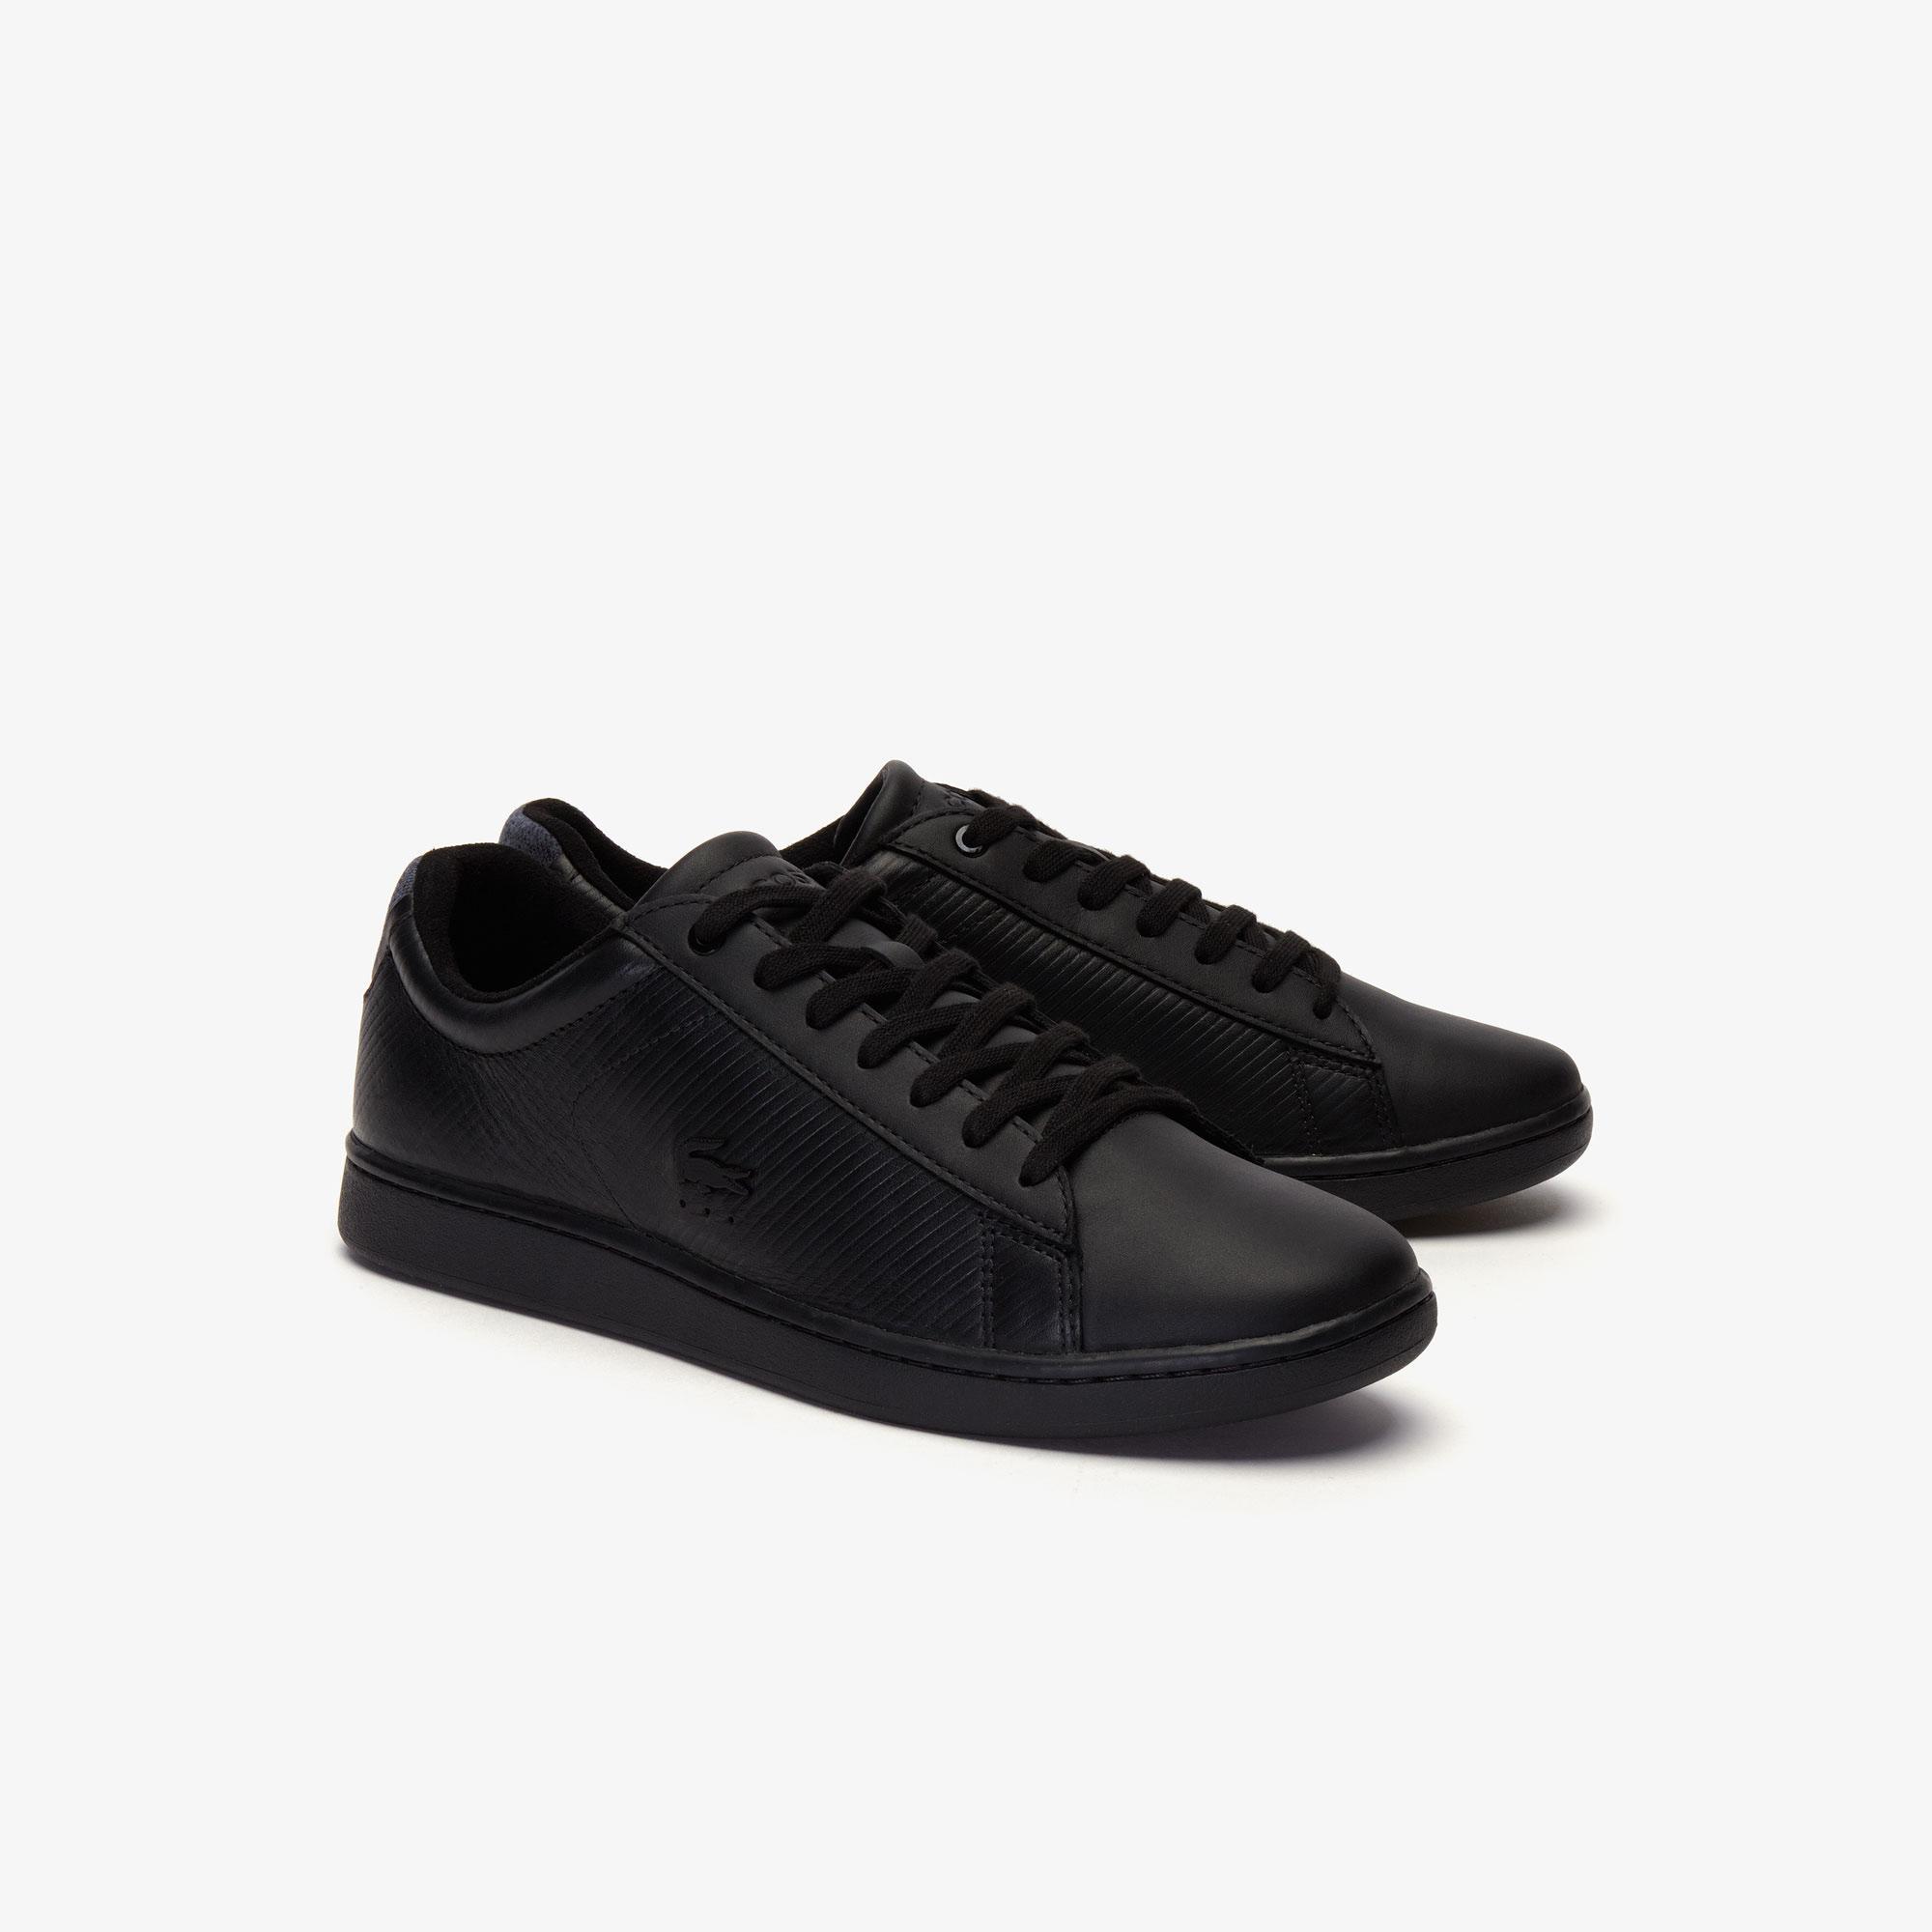 Lacoste Men's Carnaby Evo 319 9 SMA Sneakers